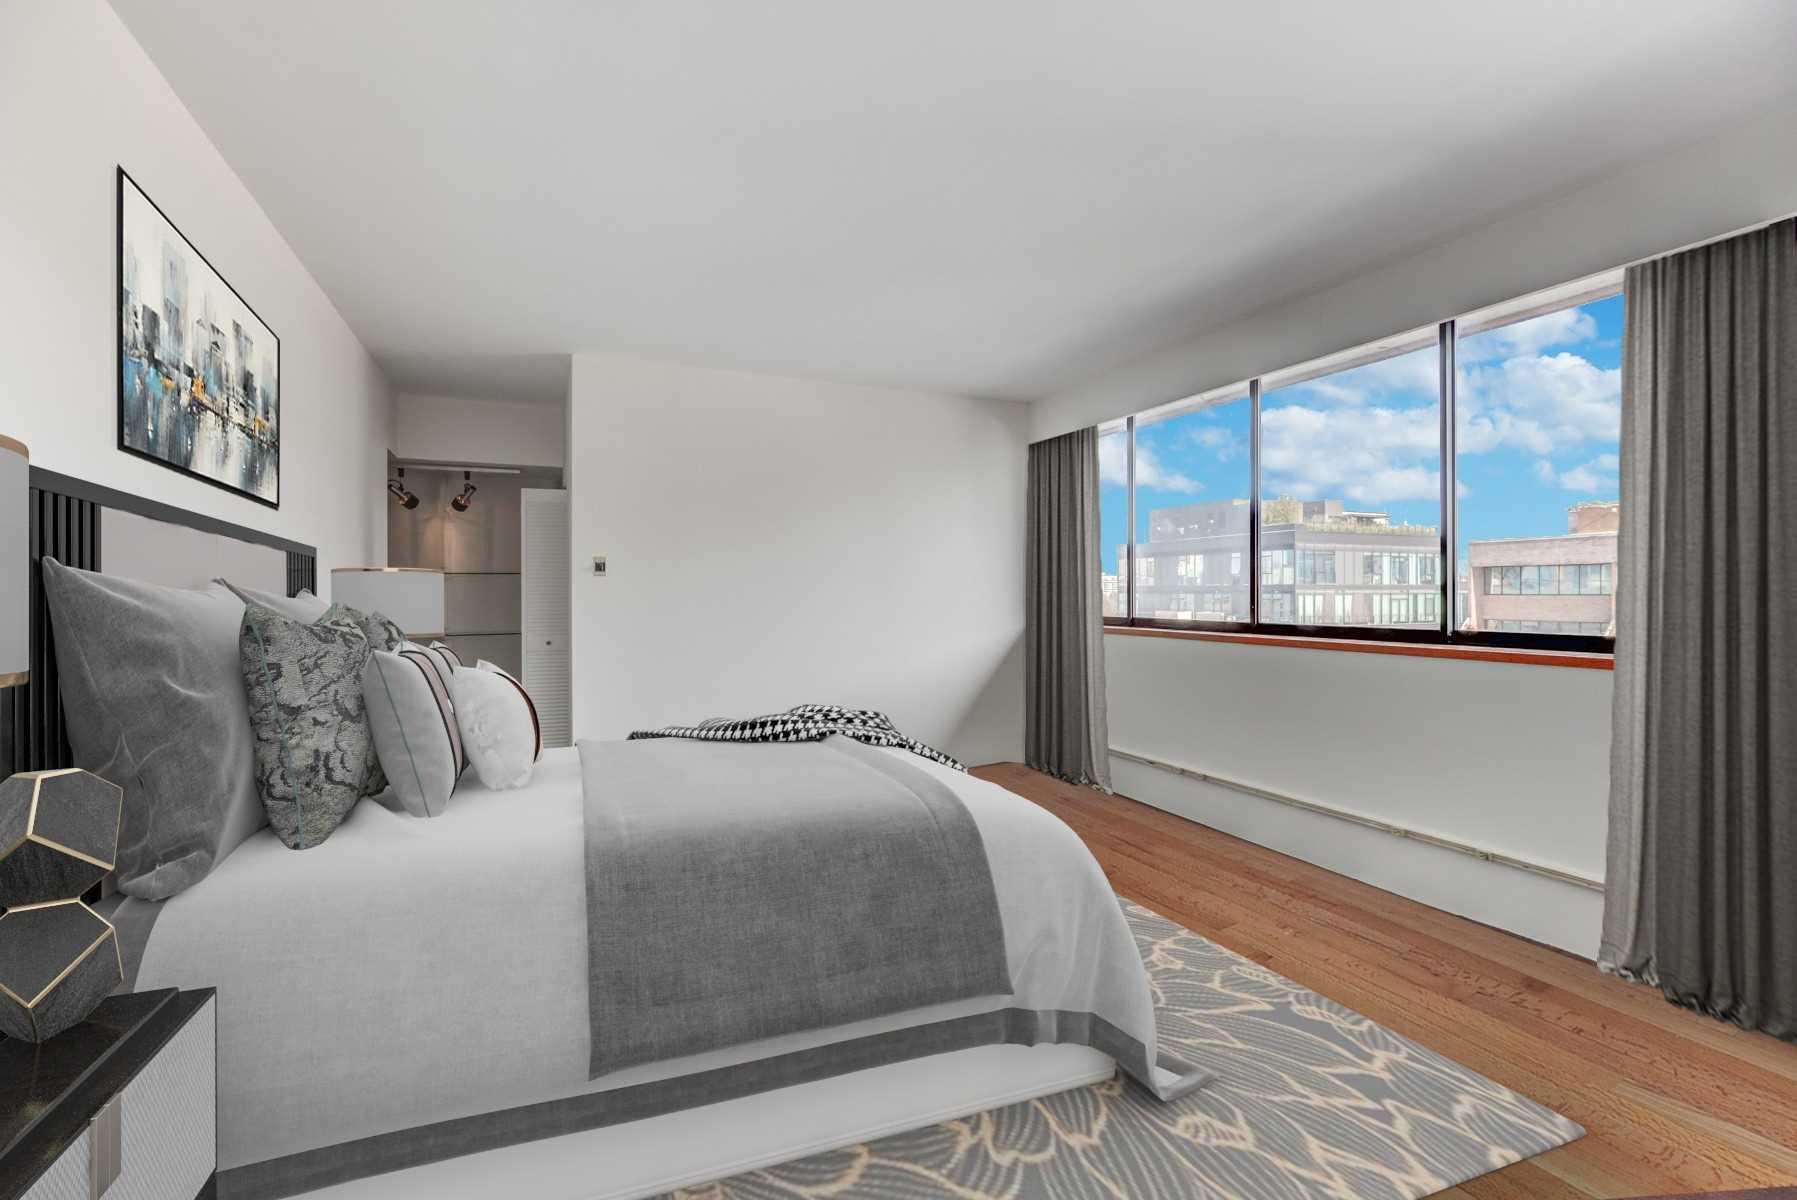 607 - 55A Avenue Rd - Annex Condo Apt for sale, 2 Bedrooms (C5185690) - #8